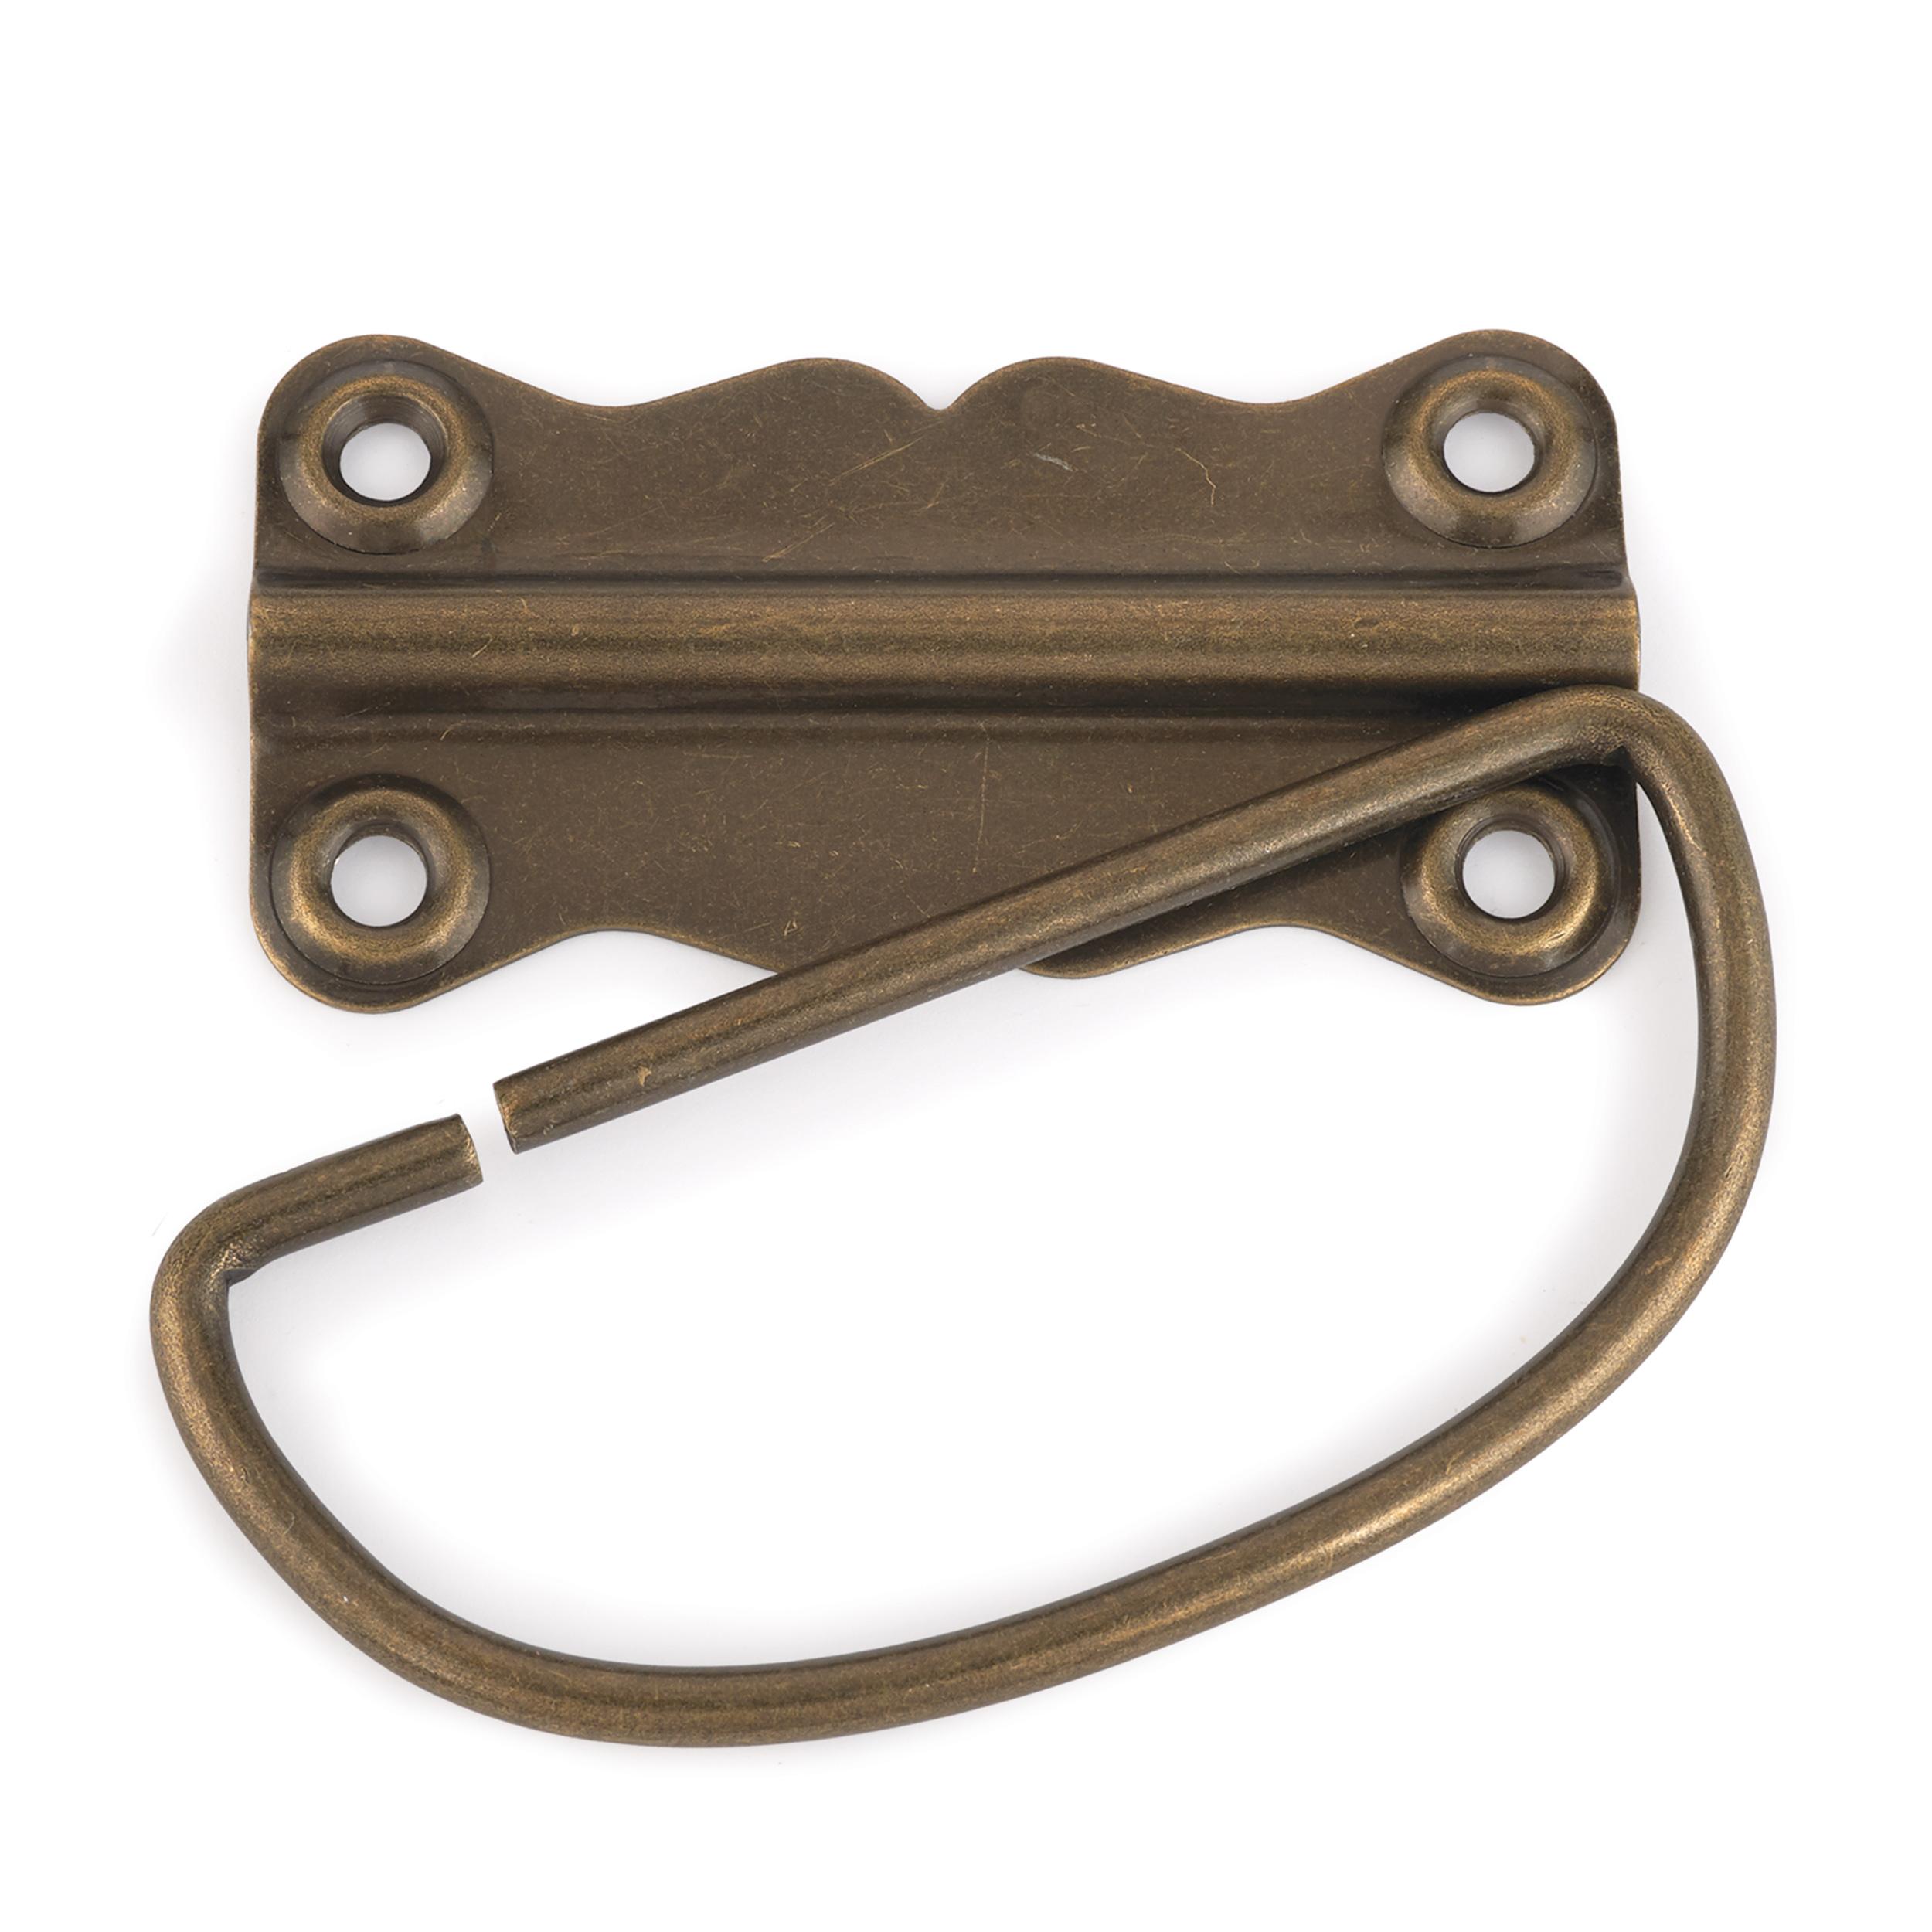 Chest Handle Antique Brass 1-piece with Screws